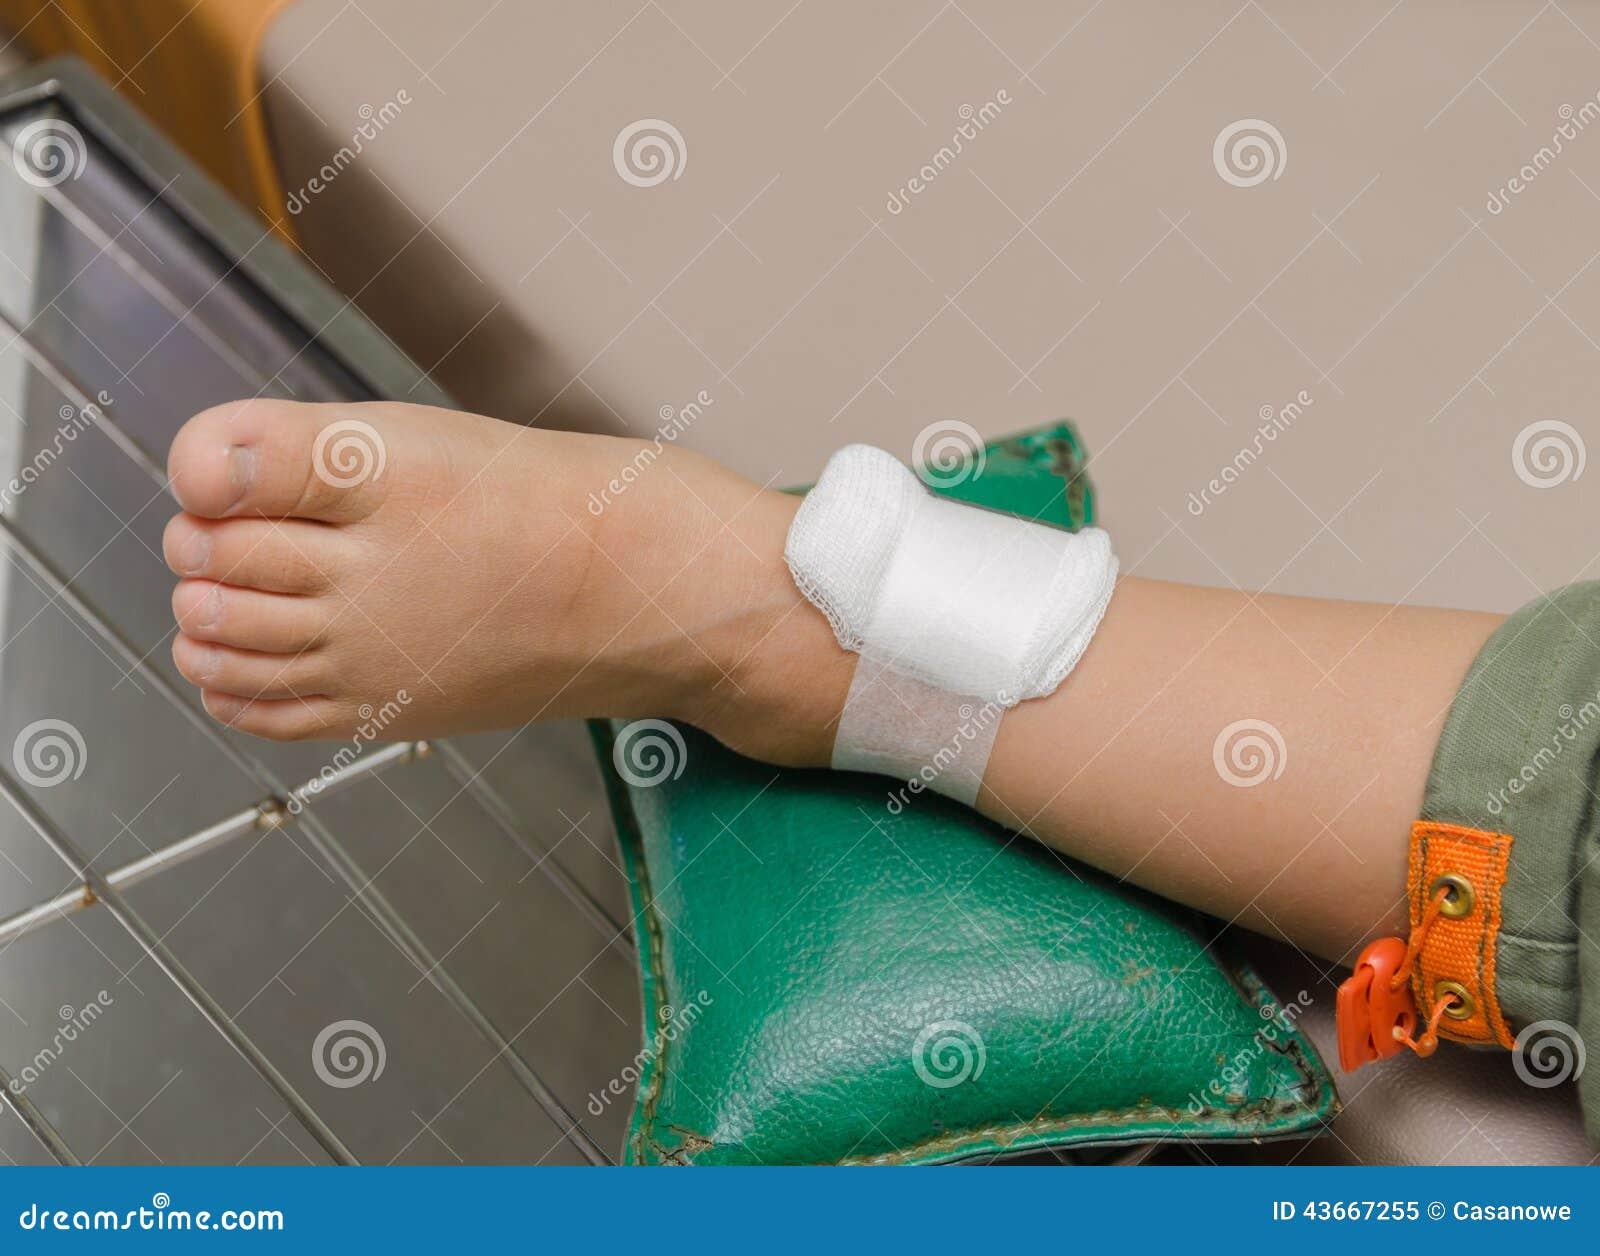 Гнойная рана лечение 84